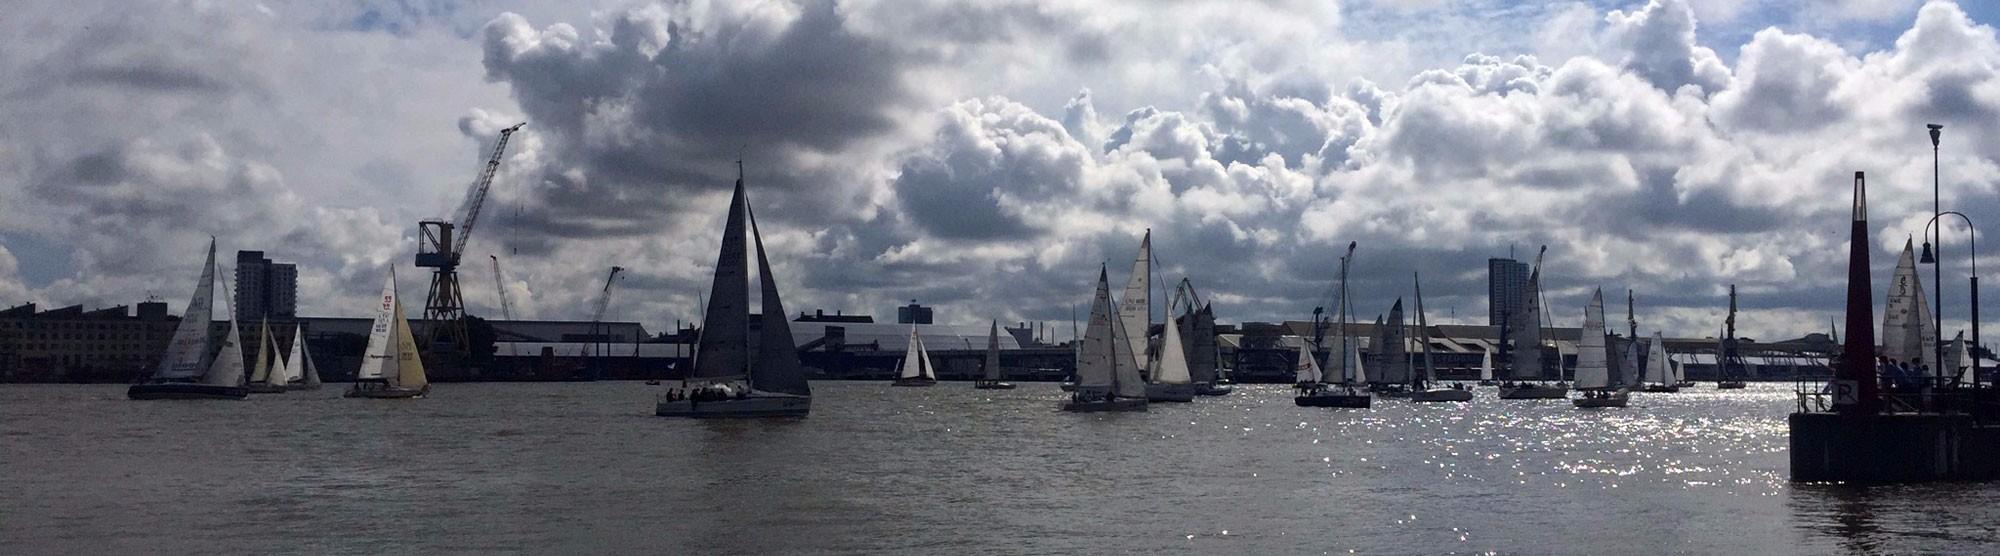 Smiltyne Yacht Club Yachthafen